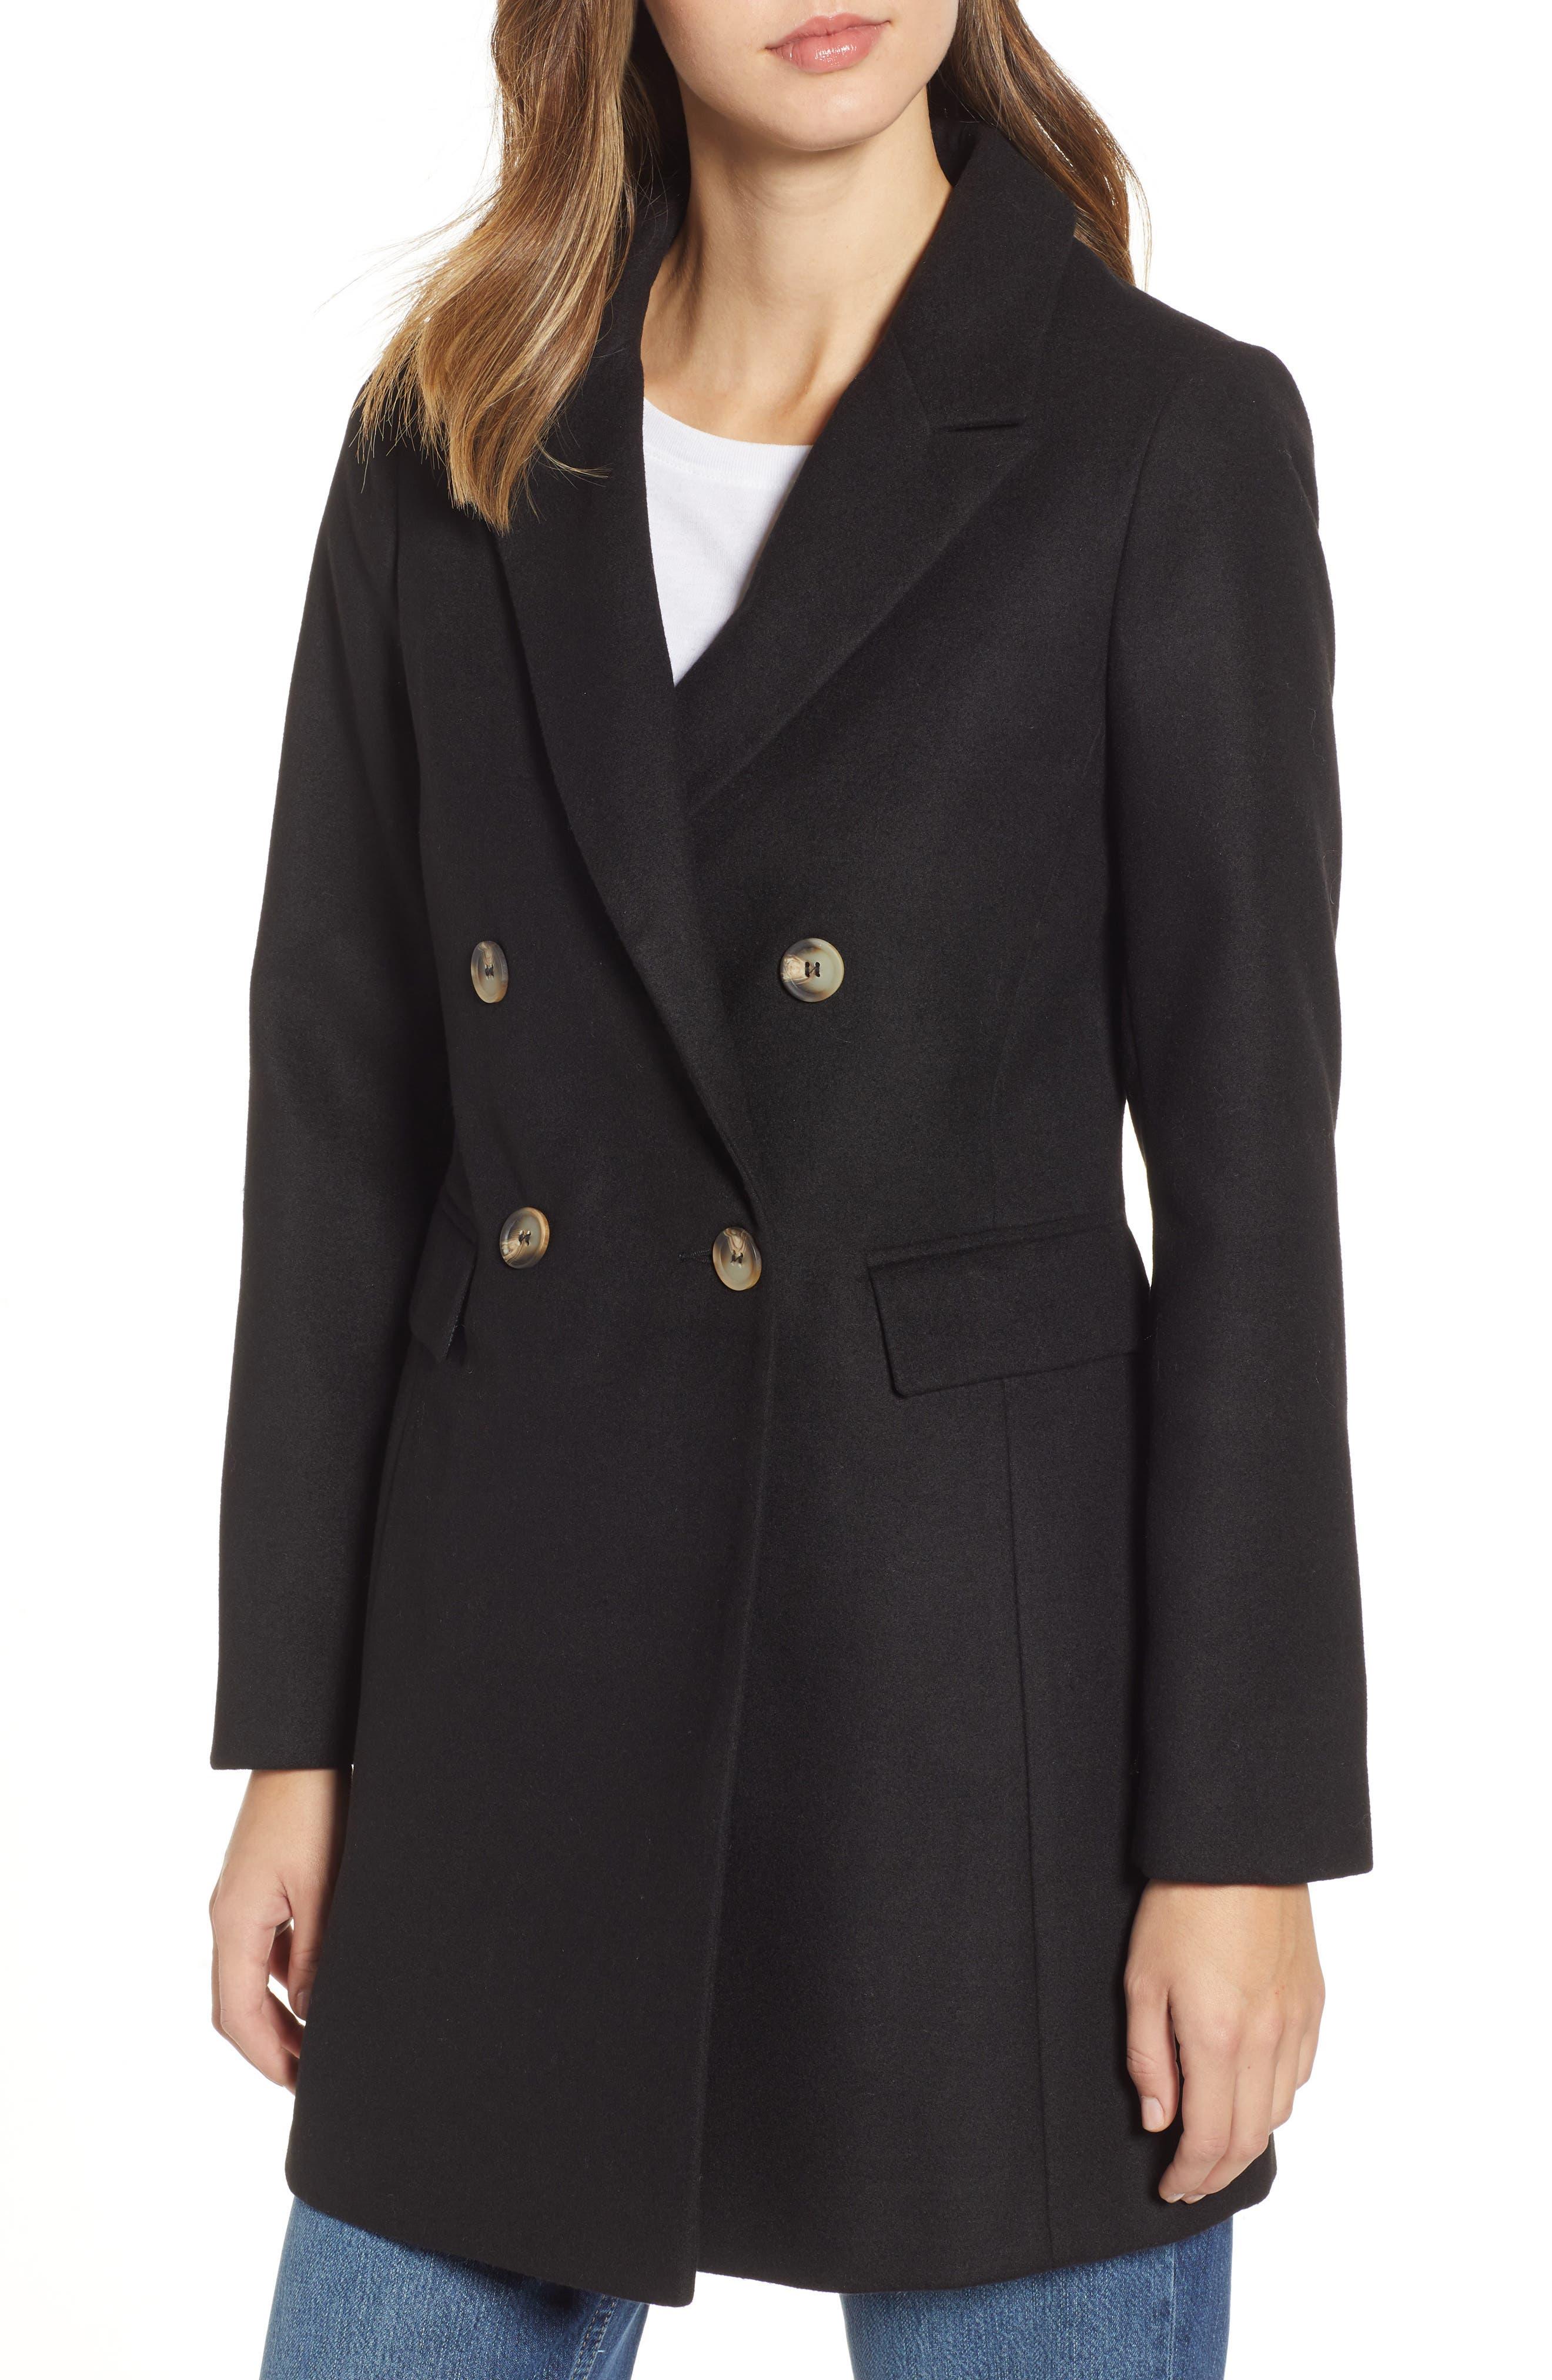 Naomi Faux Fur Collar Coat,                             Alternate thumbnail 2, color,                             BLACK